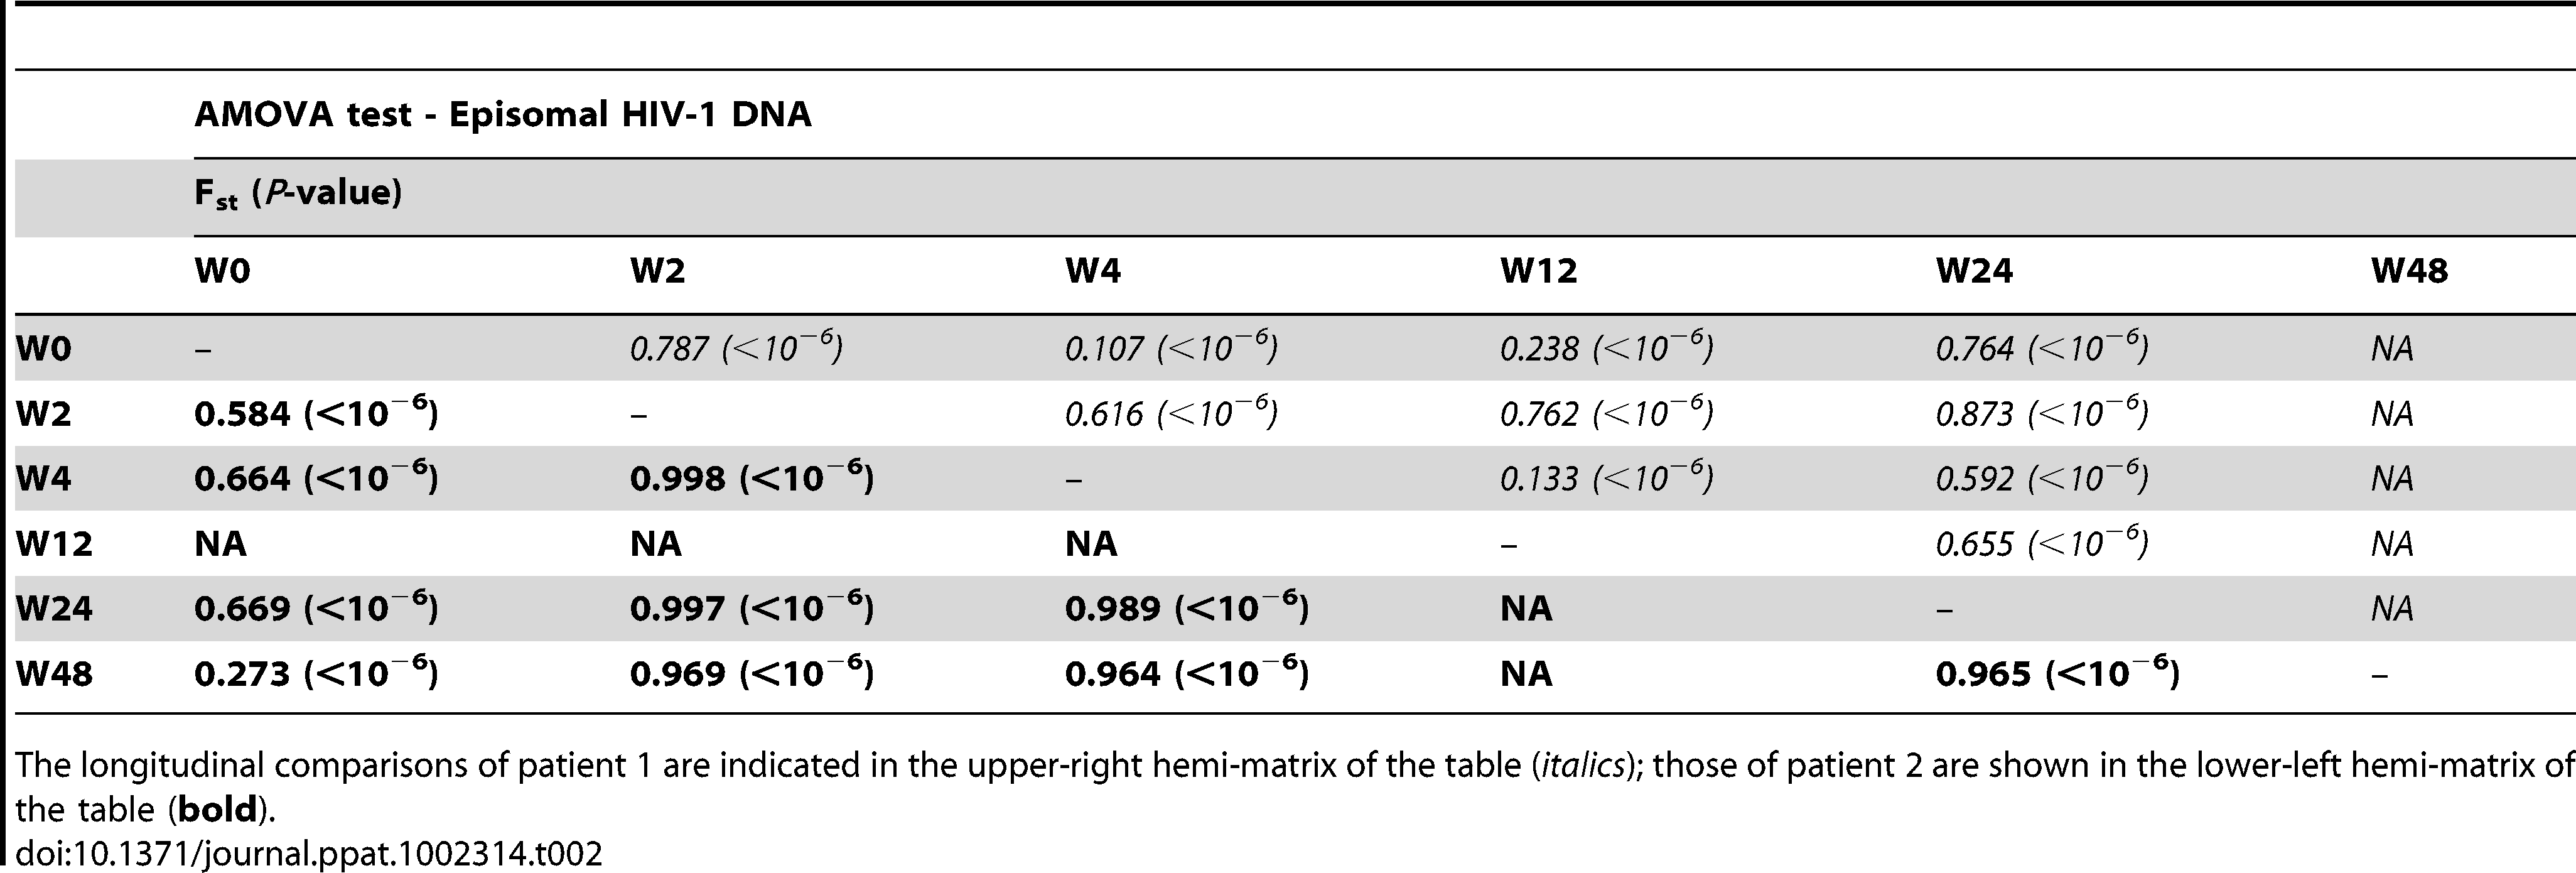 Temporal population structure: AMOVA test for comparison between longitudinal episomal HIV-1 DNA.